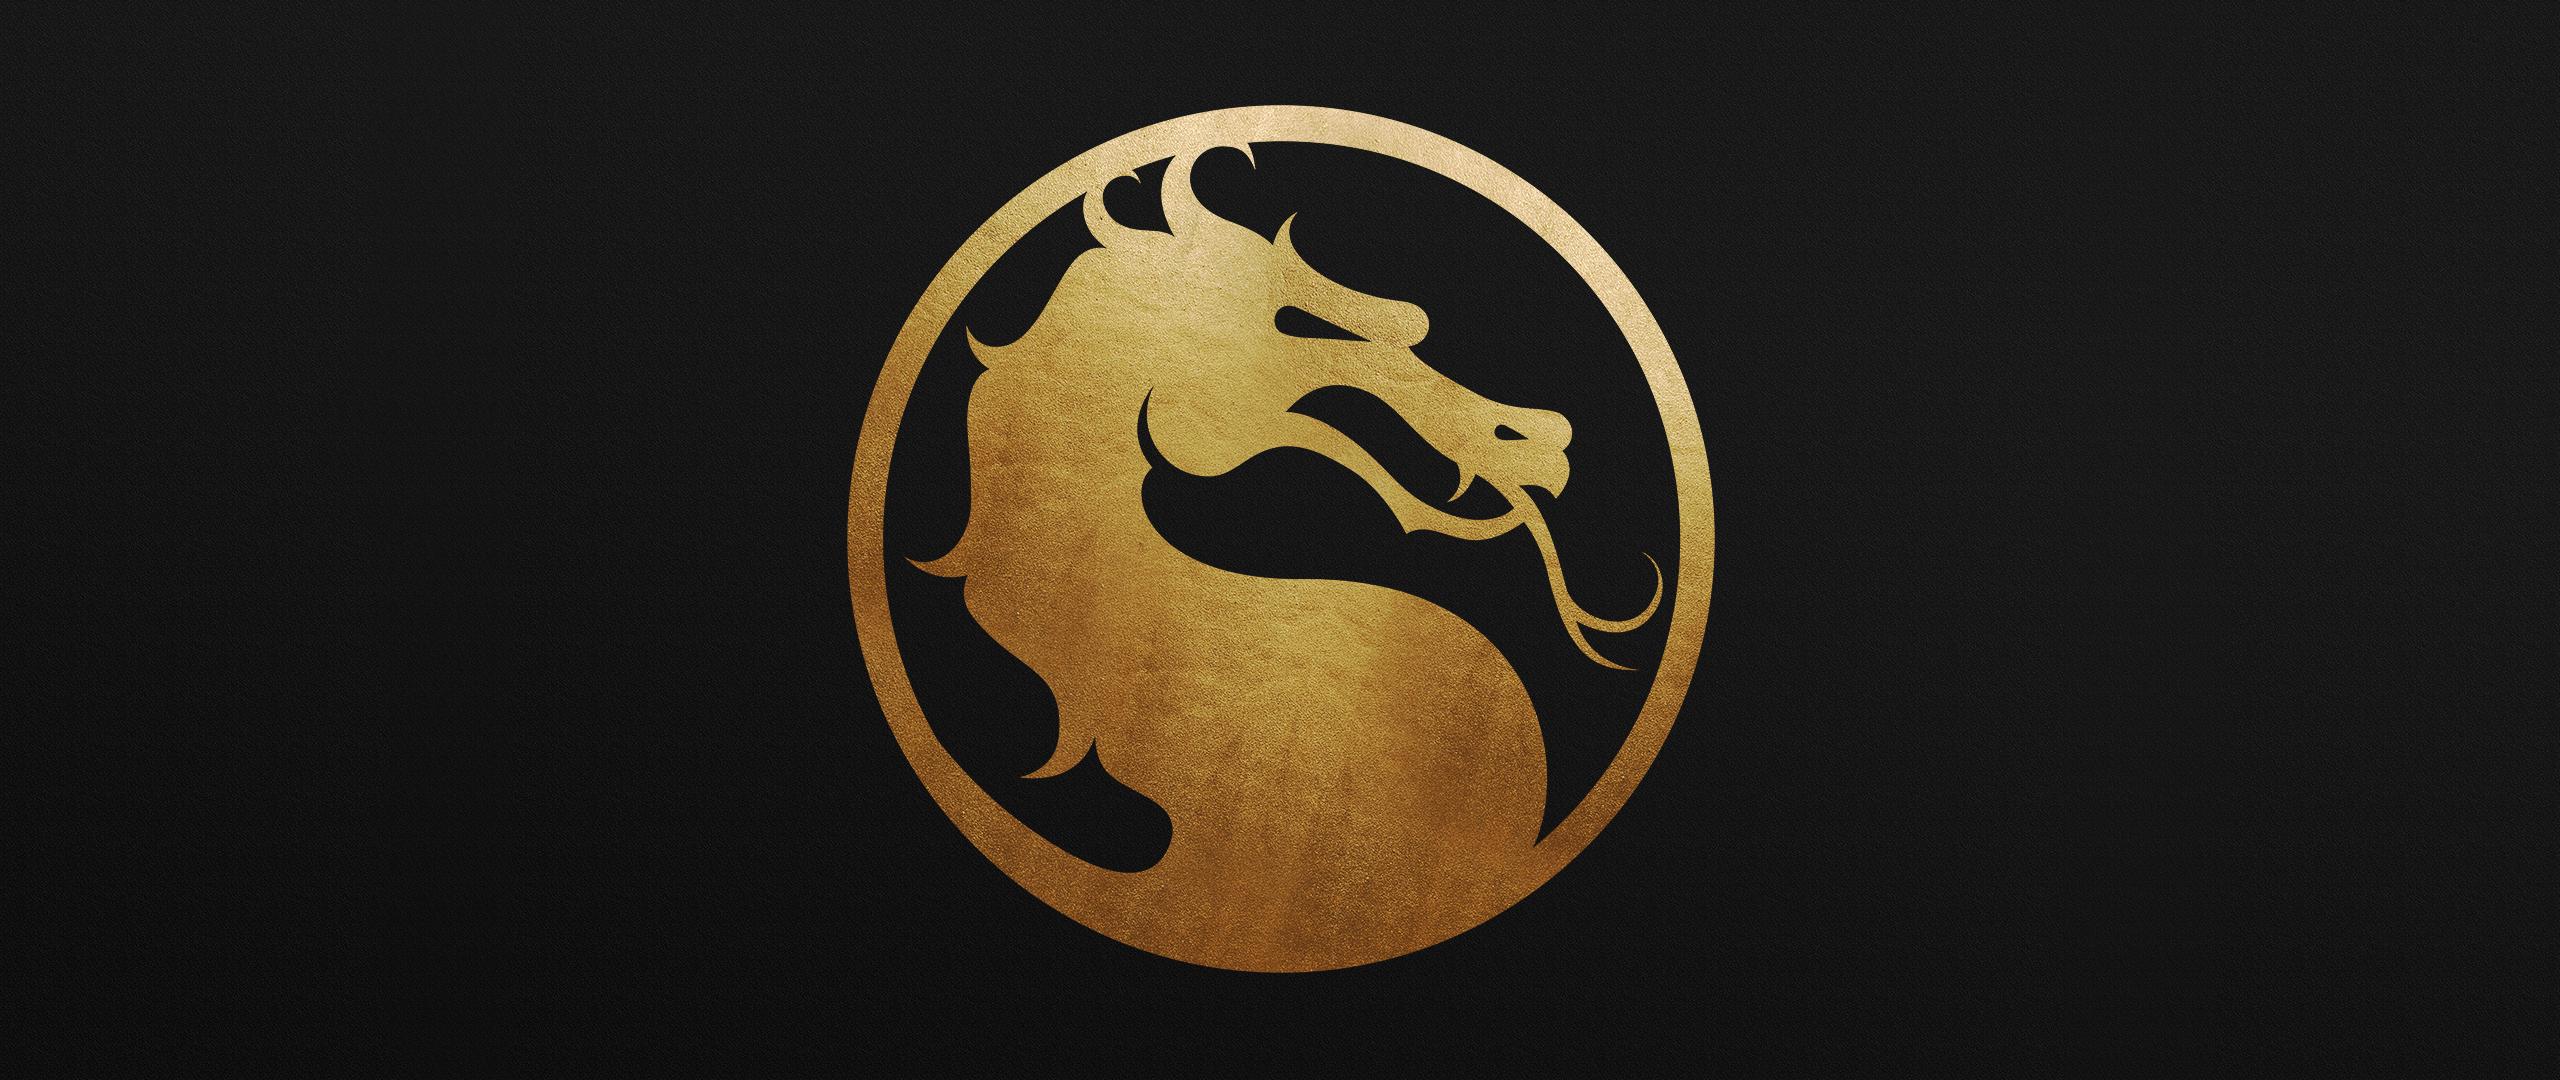 2560x1080 Mortal Kombat 11 Logo 2560x1080 Resolution ...